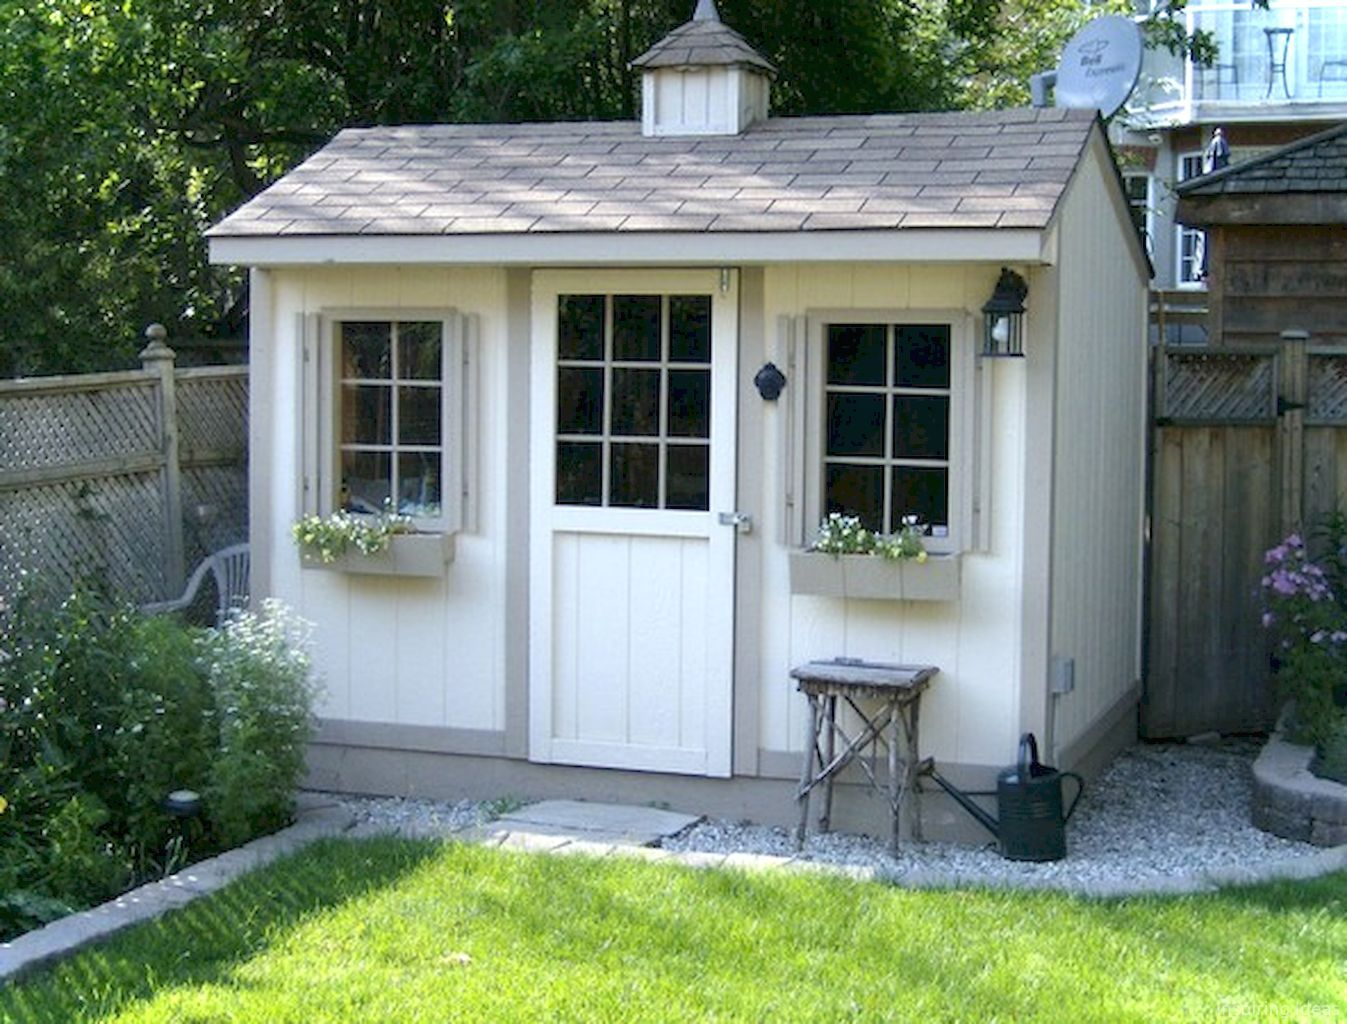 55 Nice Garden Shed Storage Ideas on a Budget Backyard